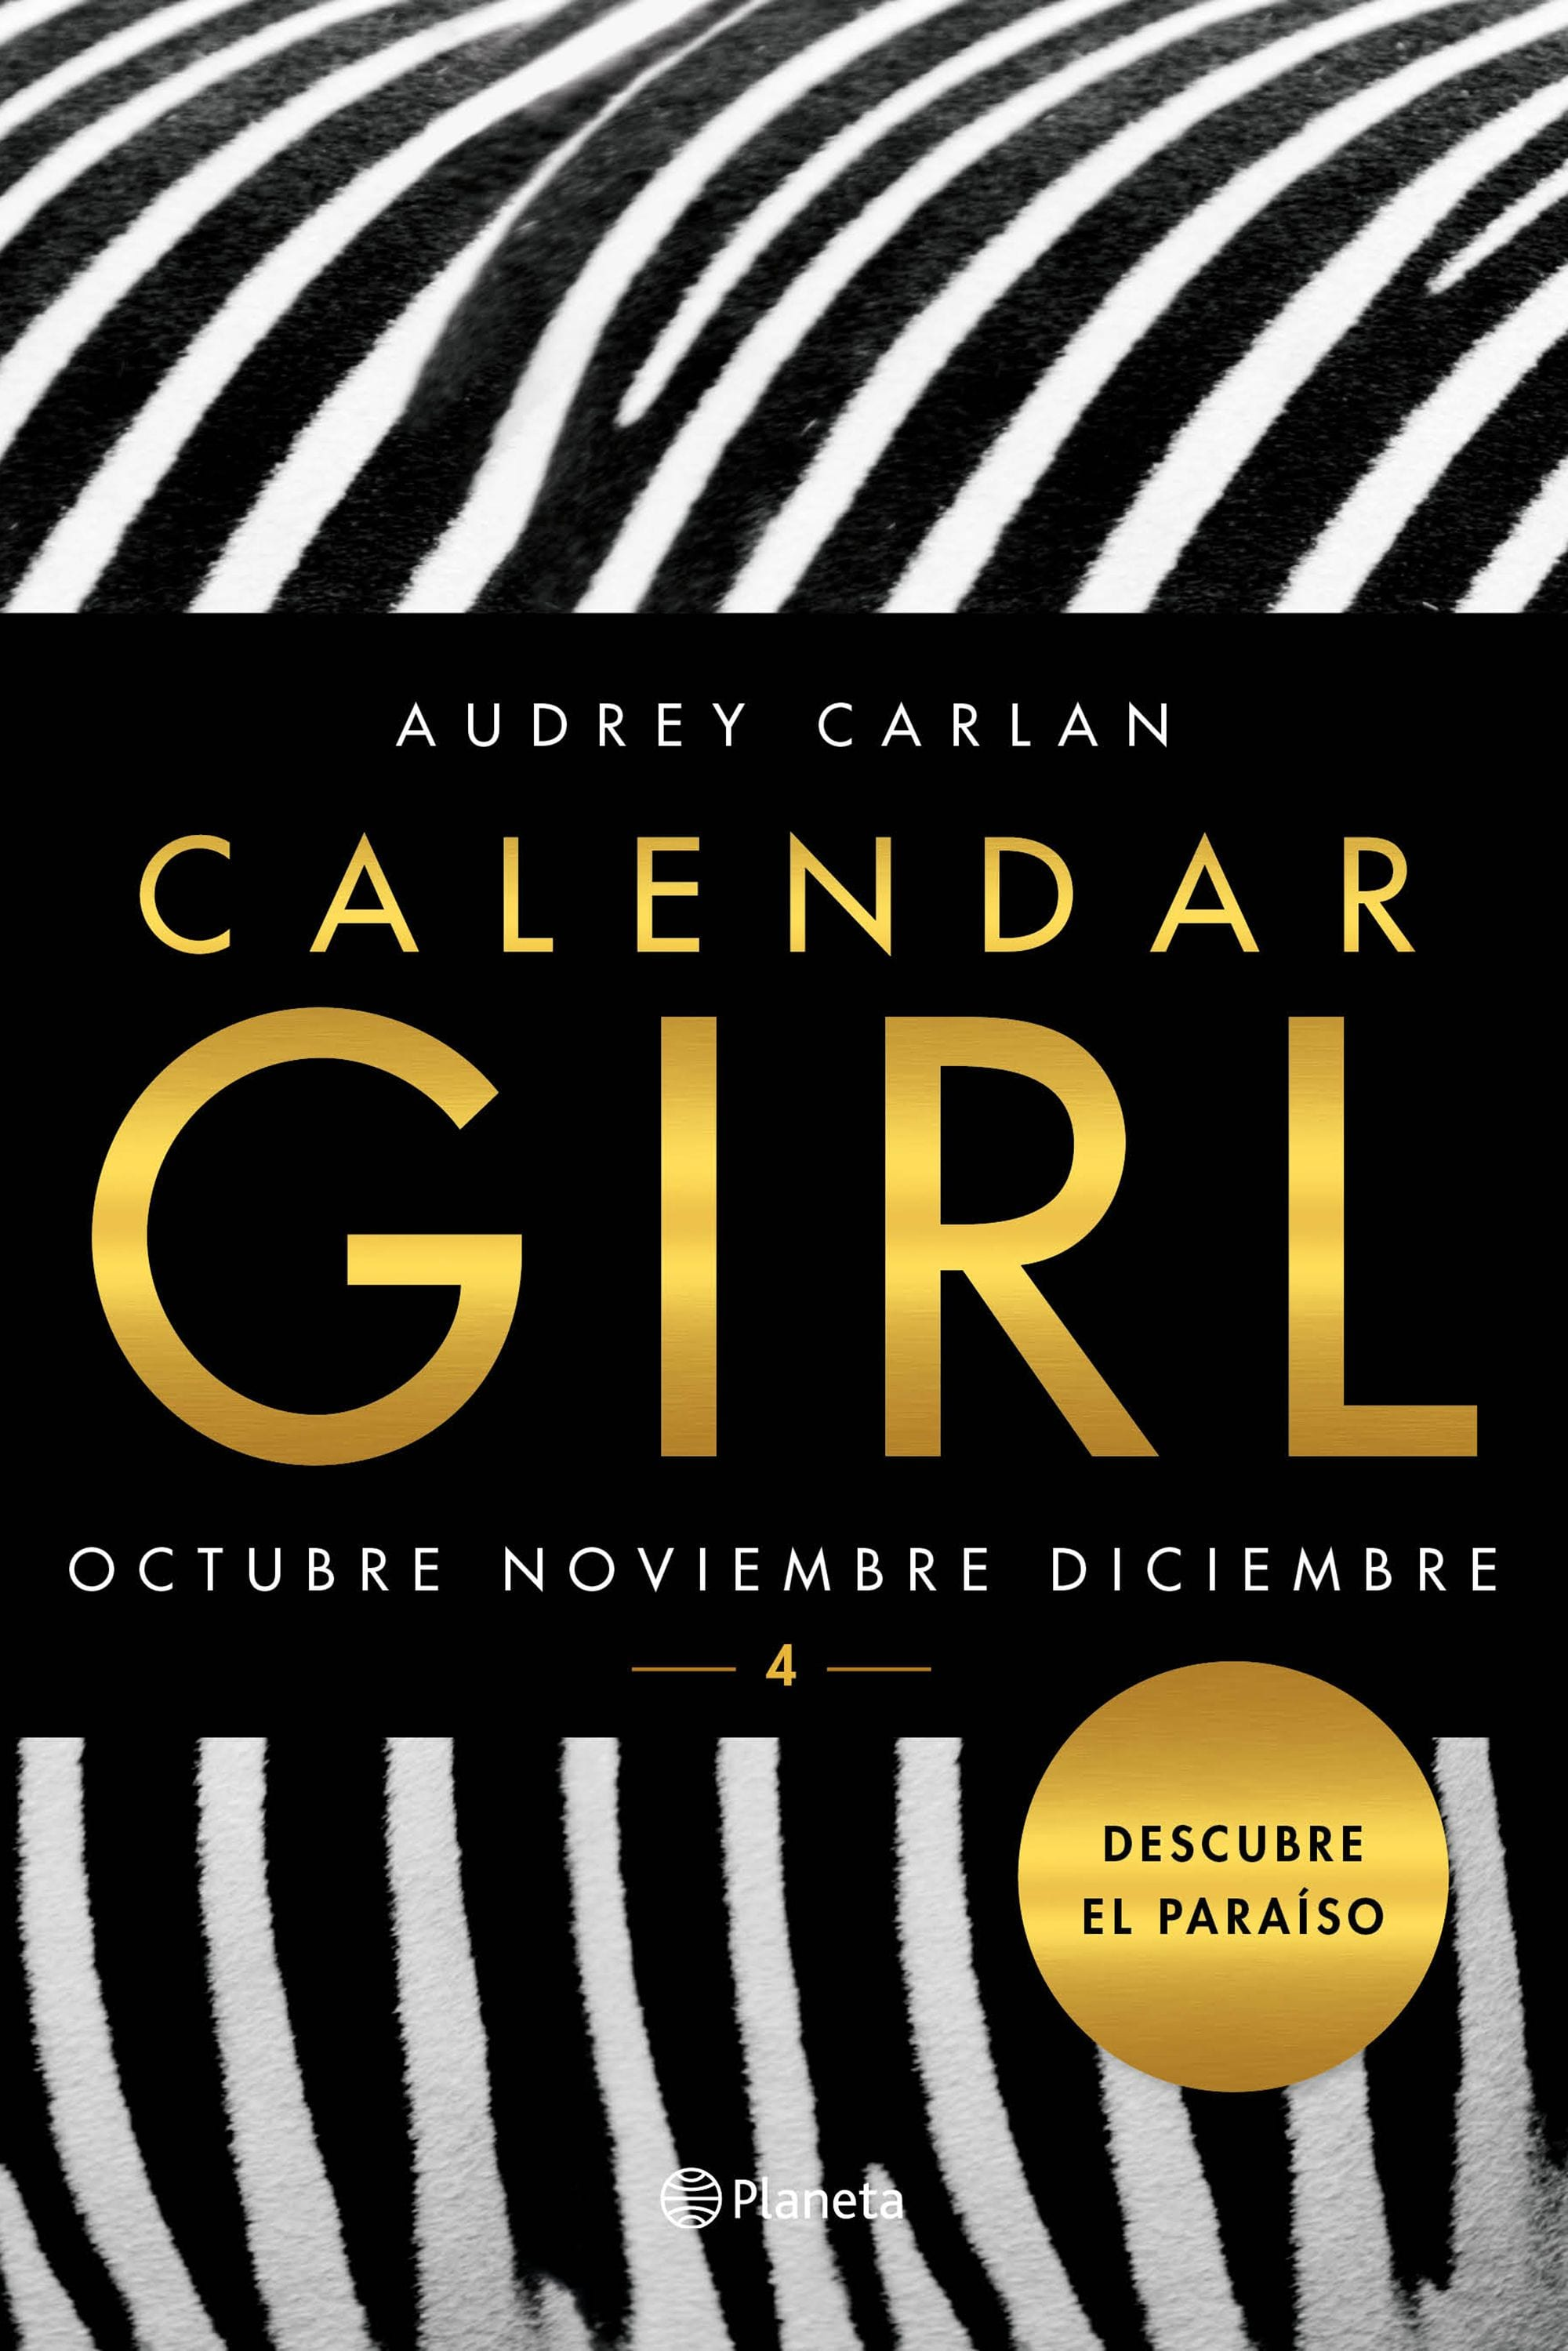 Calendar Girl 4: Octubre, Noviembre y Diciembre, de Audrey Carlan - Reseña